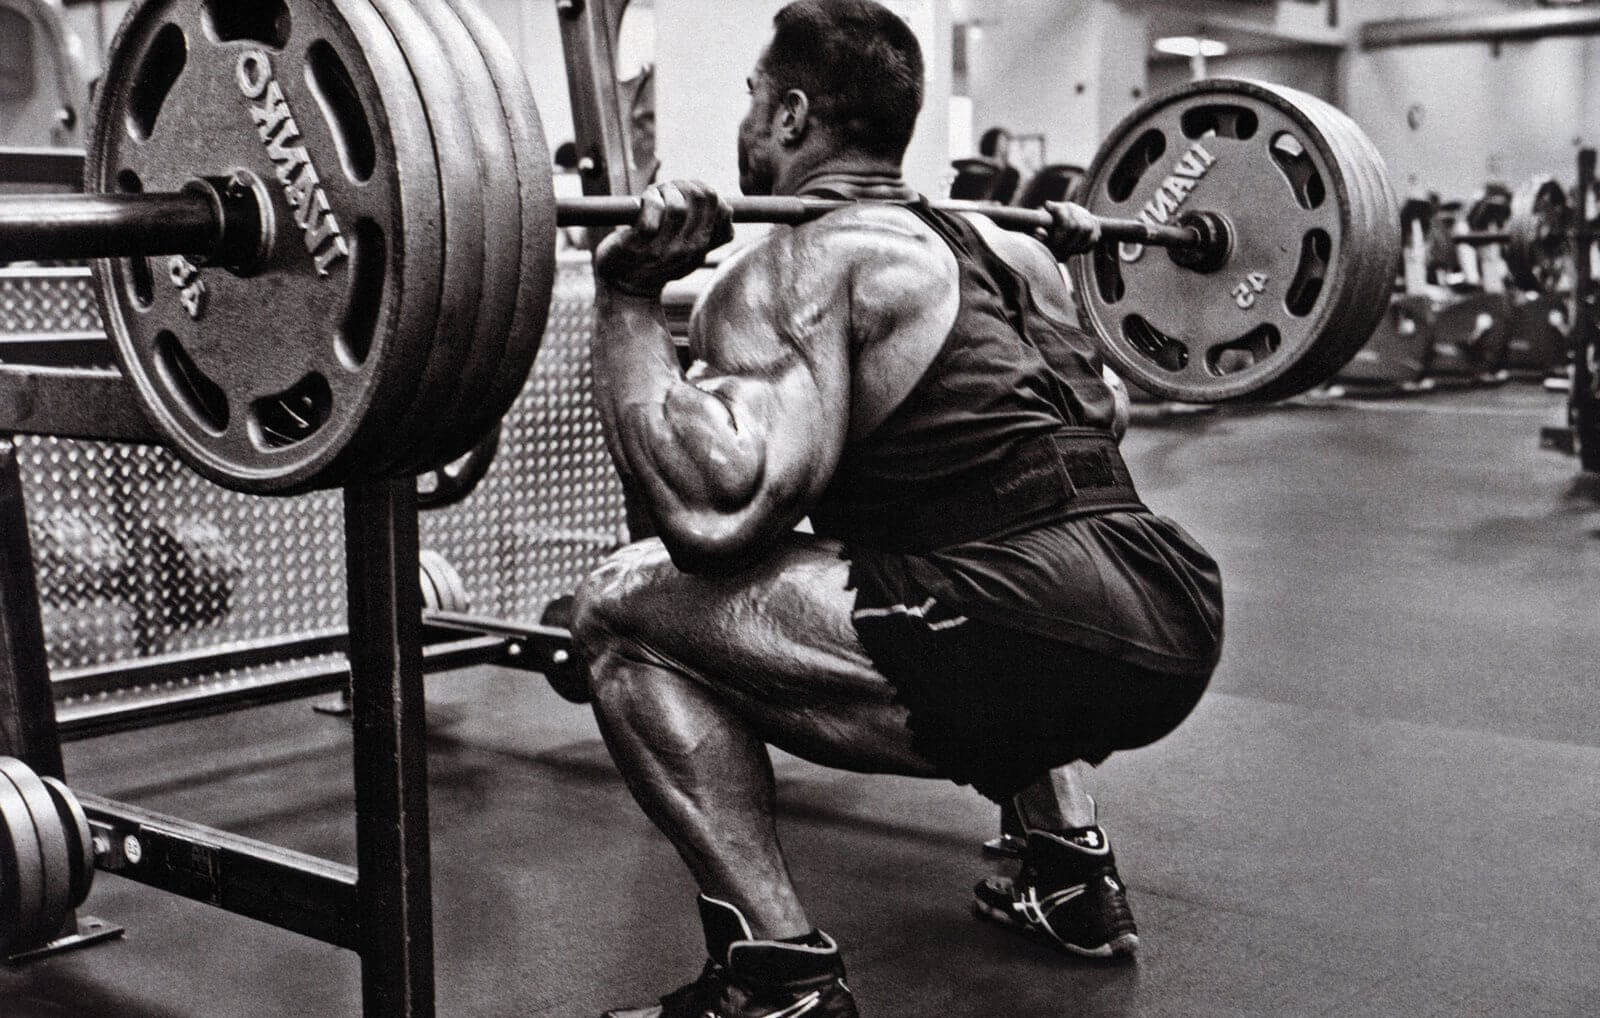 тренировка в спортзале на сжигание жира